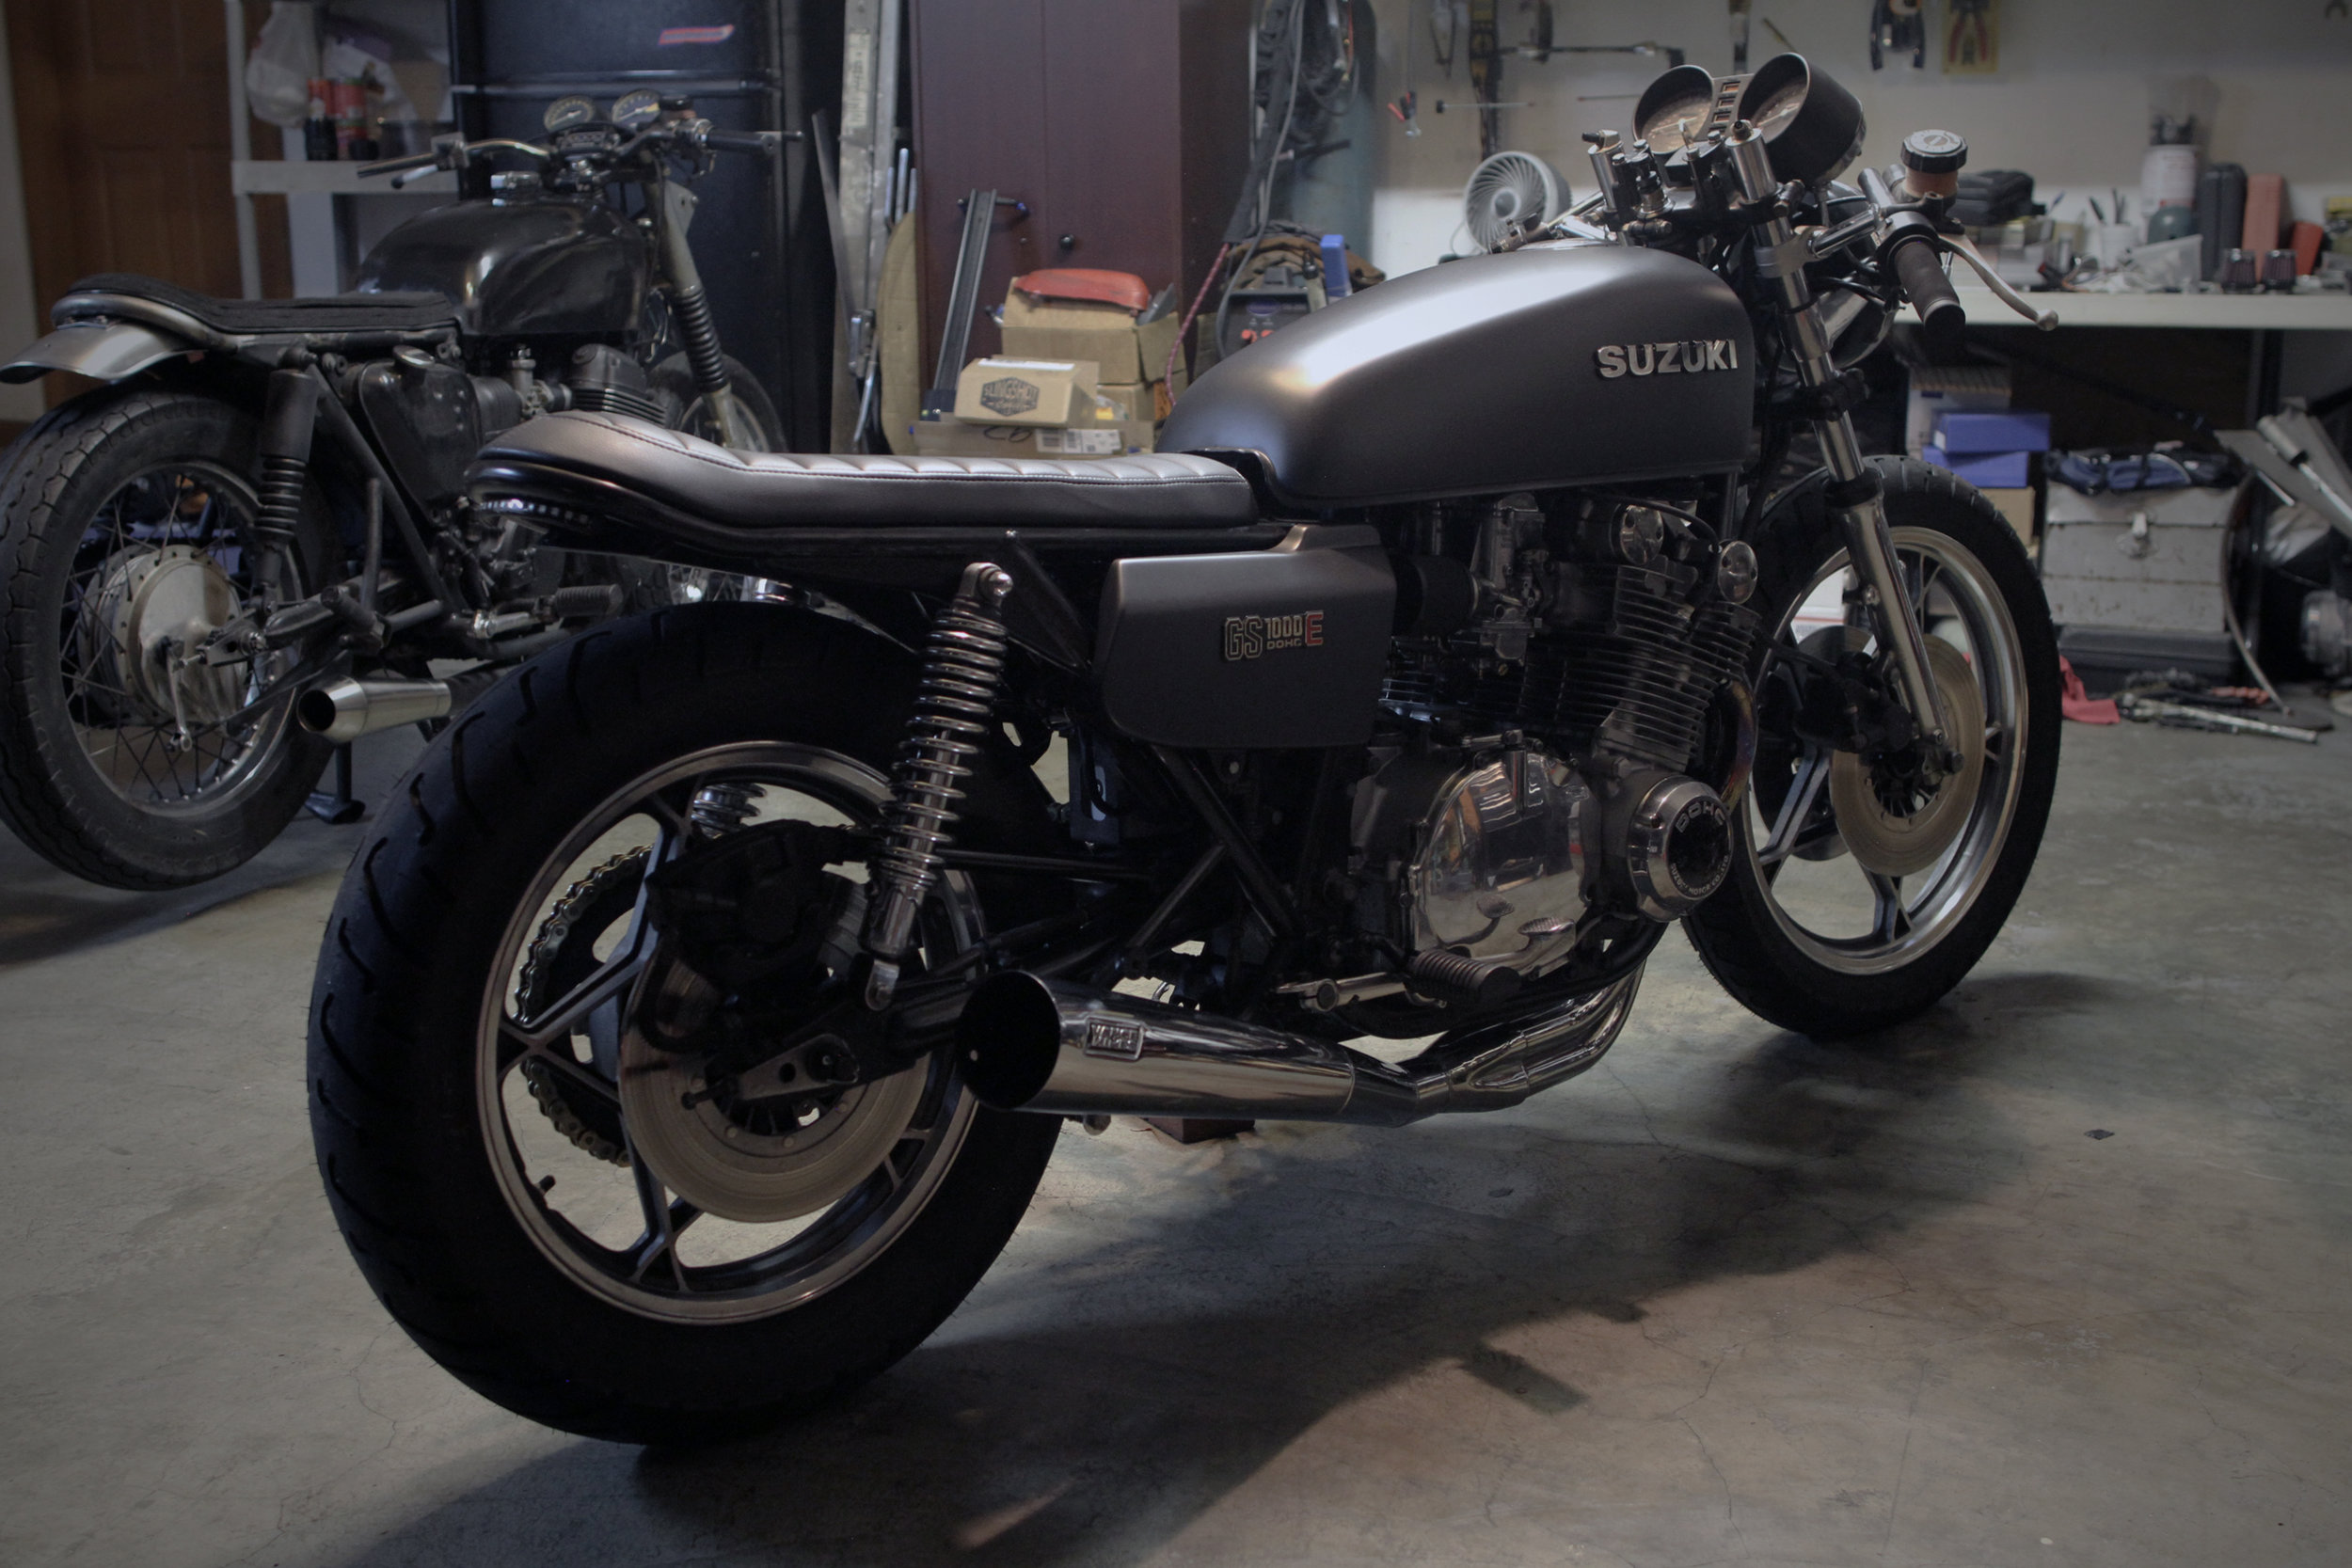 1979 Suzuki GS1000E - Brat Style Cafe Racer